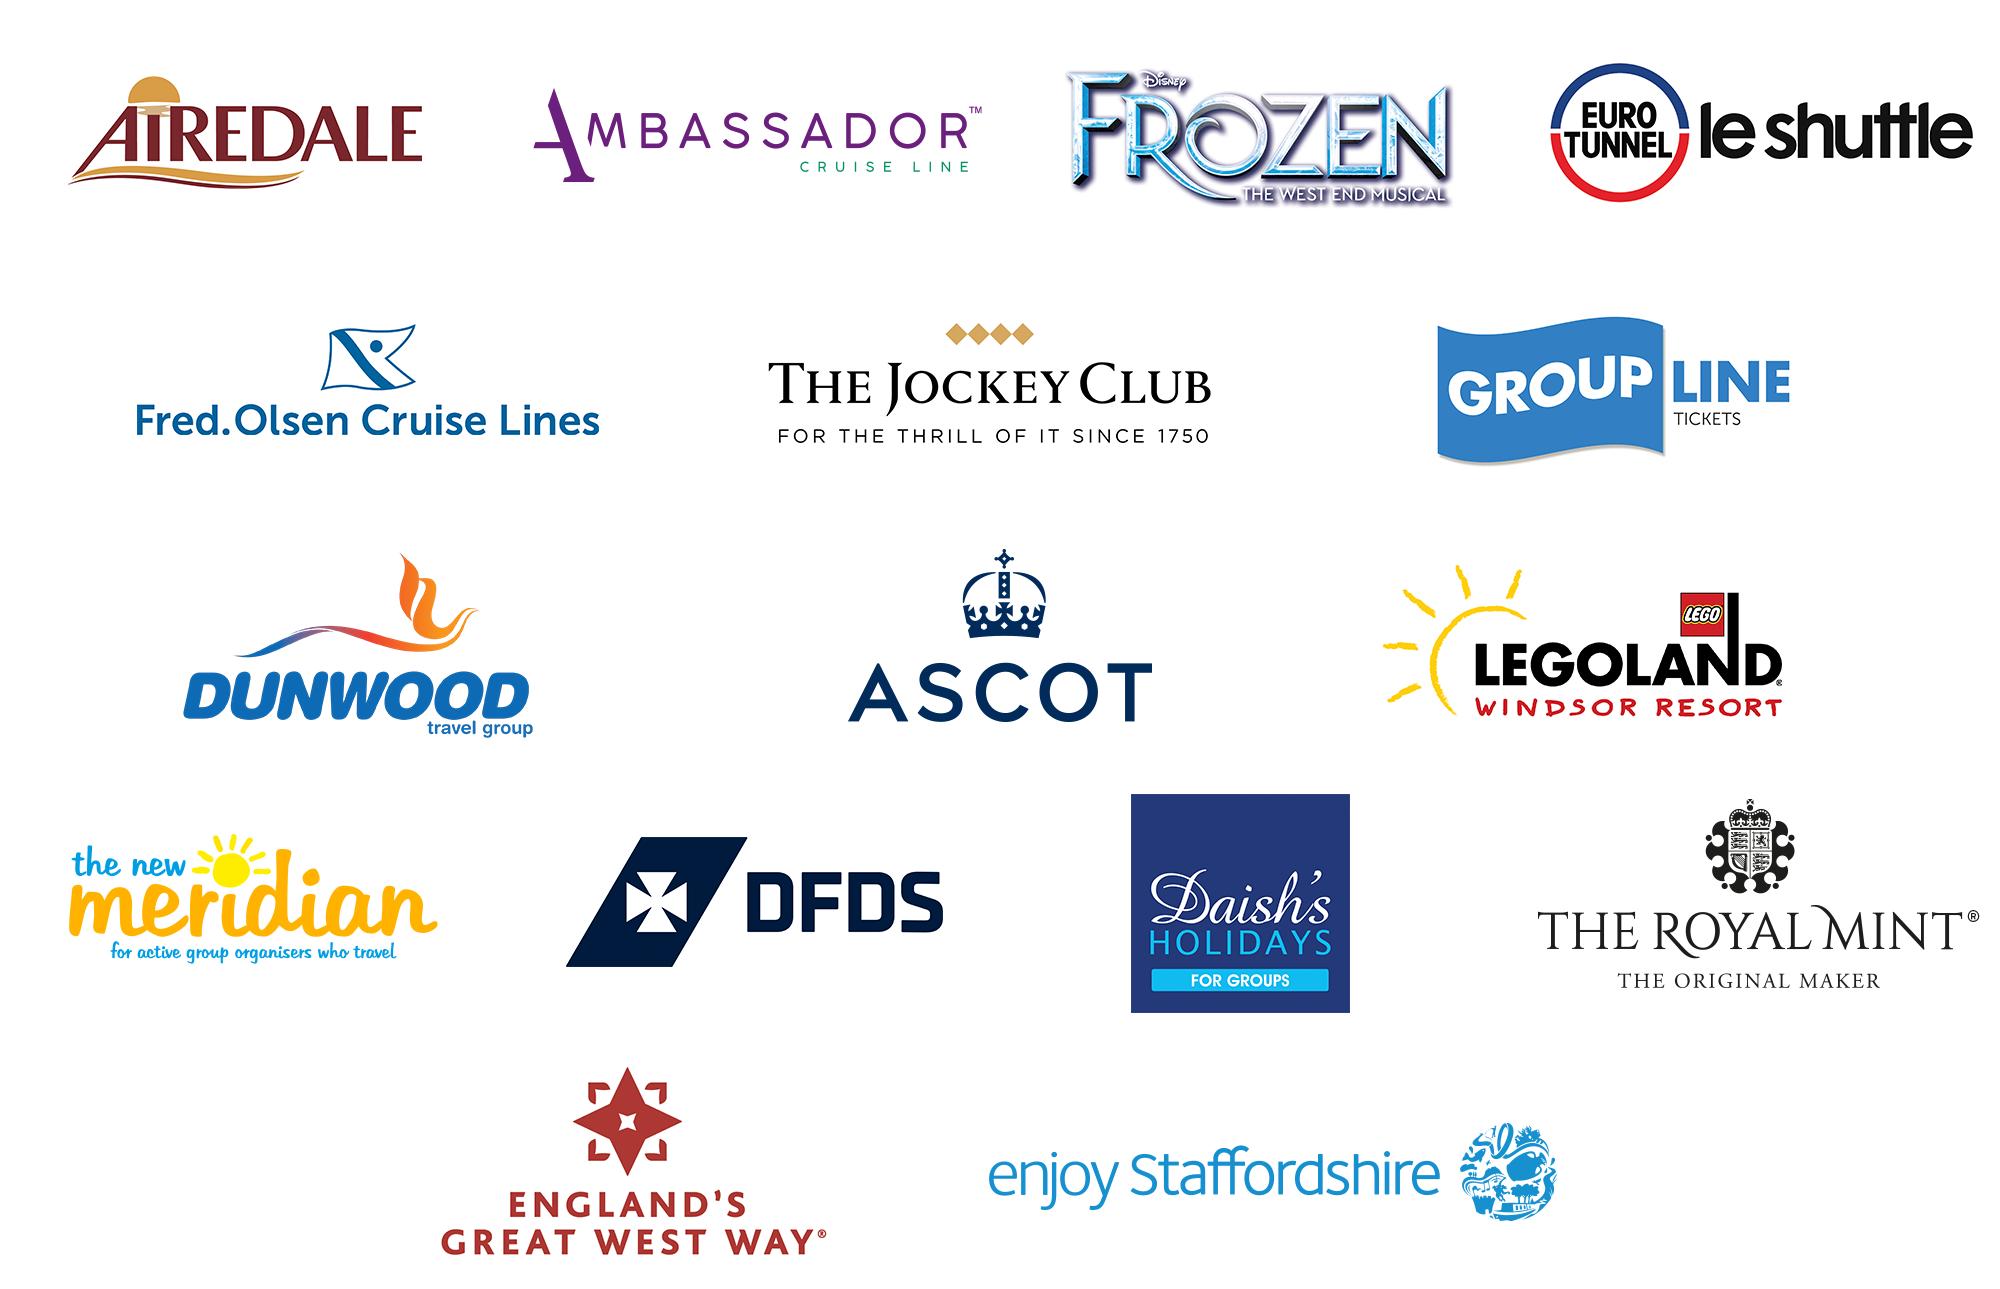 Group Leisure & Travel Awards Partners 2021